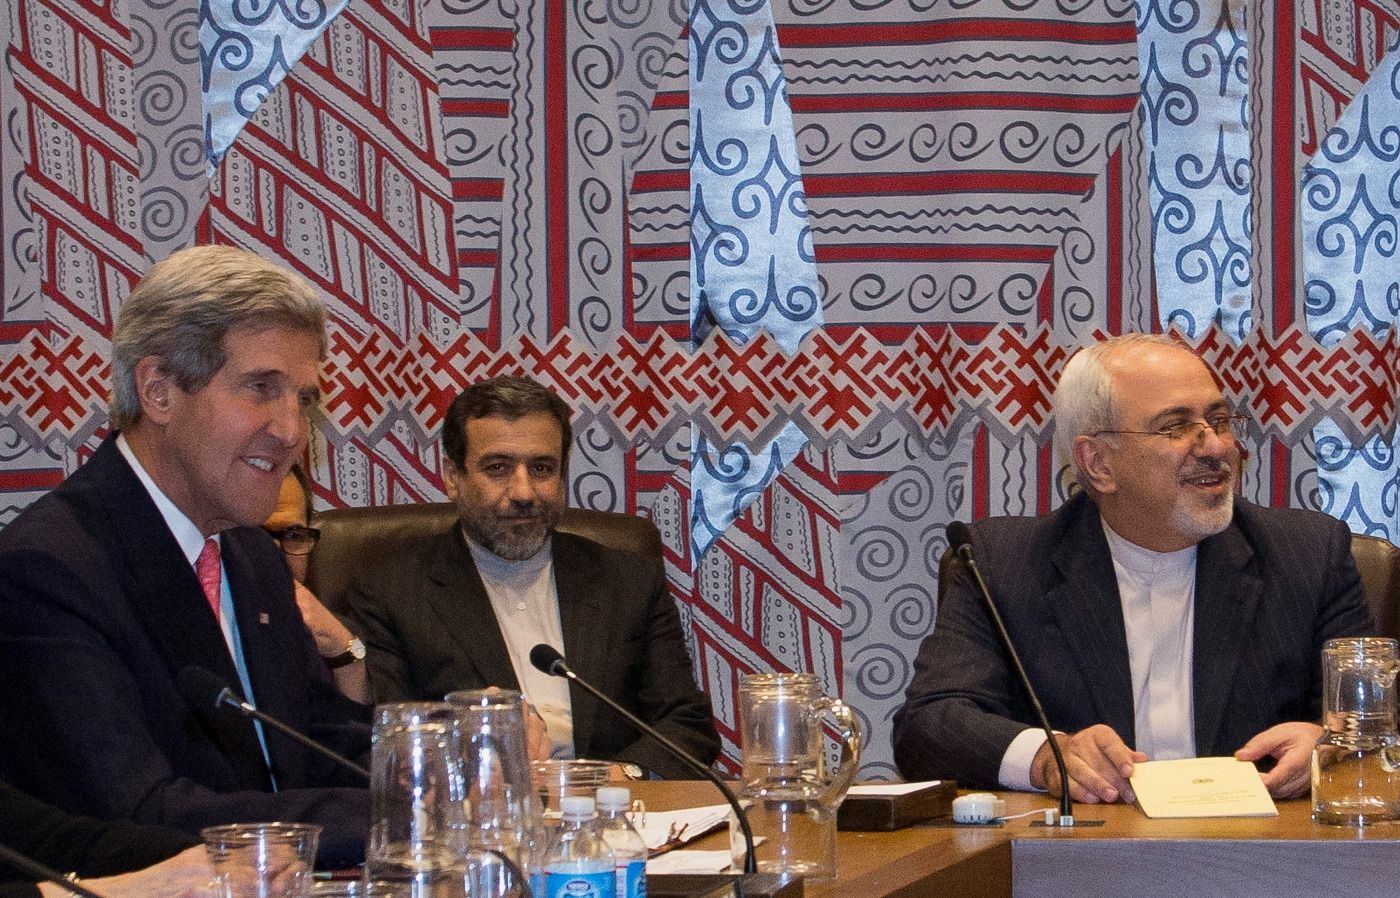 OHE: Ιστορική συνάντηση Κέρι – Ζαρίφ για το πυρηνικό πρόγραμμα του Ιράν